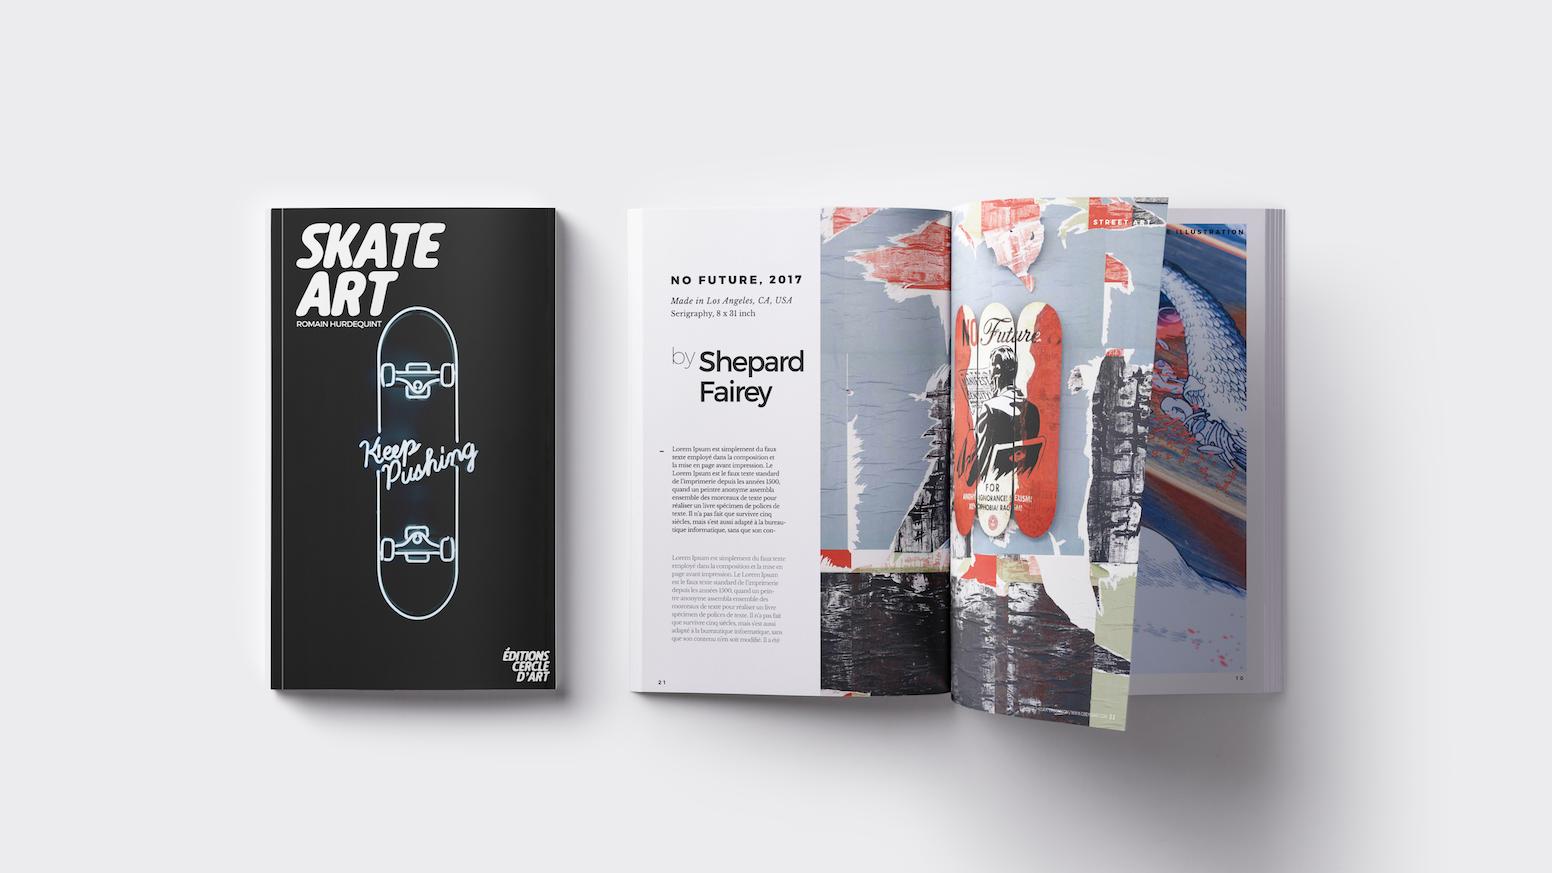 Skate Art Art Illustration Design Broken Boards By